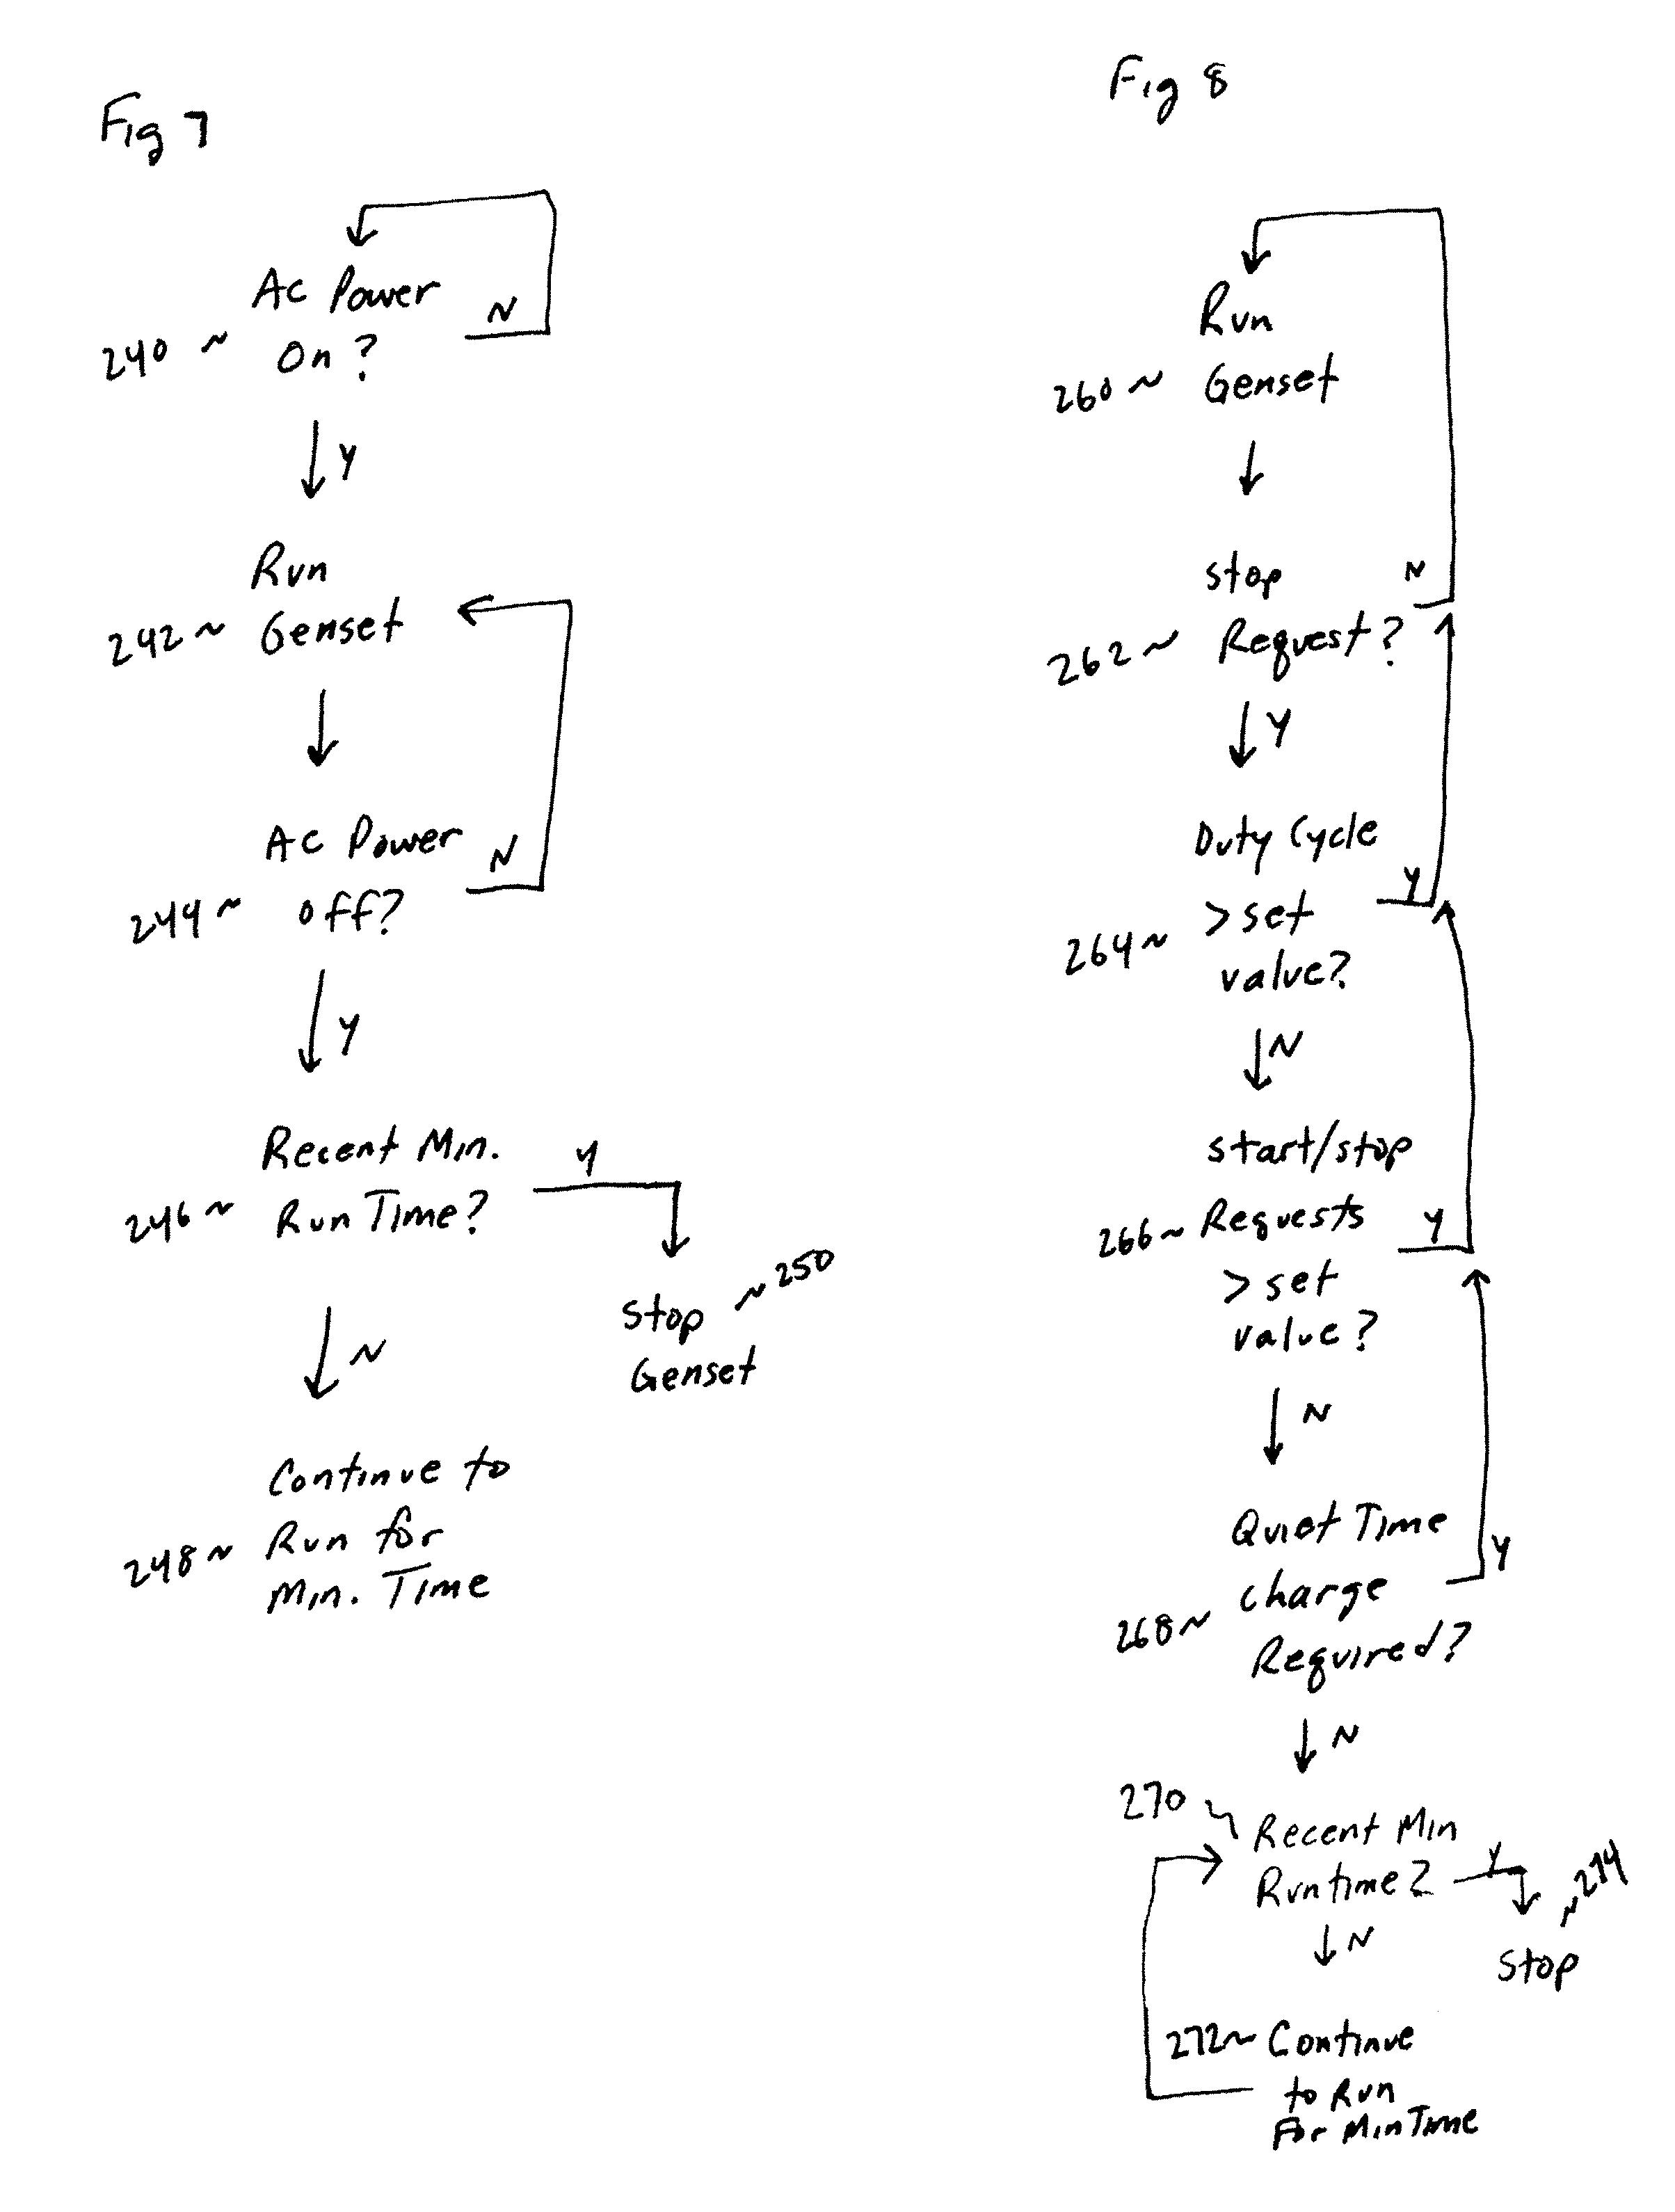 US07692409 20100406 D00007 onan microlite 4000 generator parts onan free image about wiring onan 2800 microlite generator wiring diagram at pacquiaovsvargaslive.co